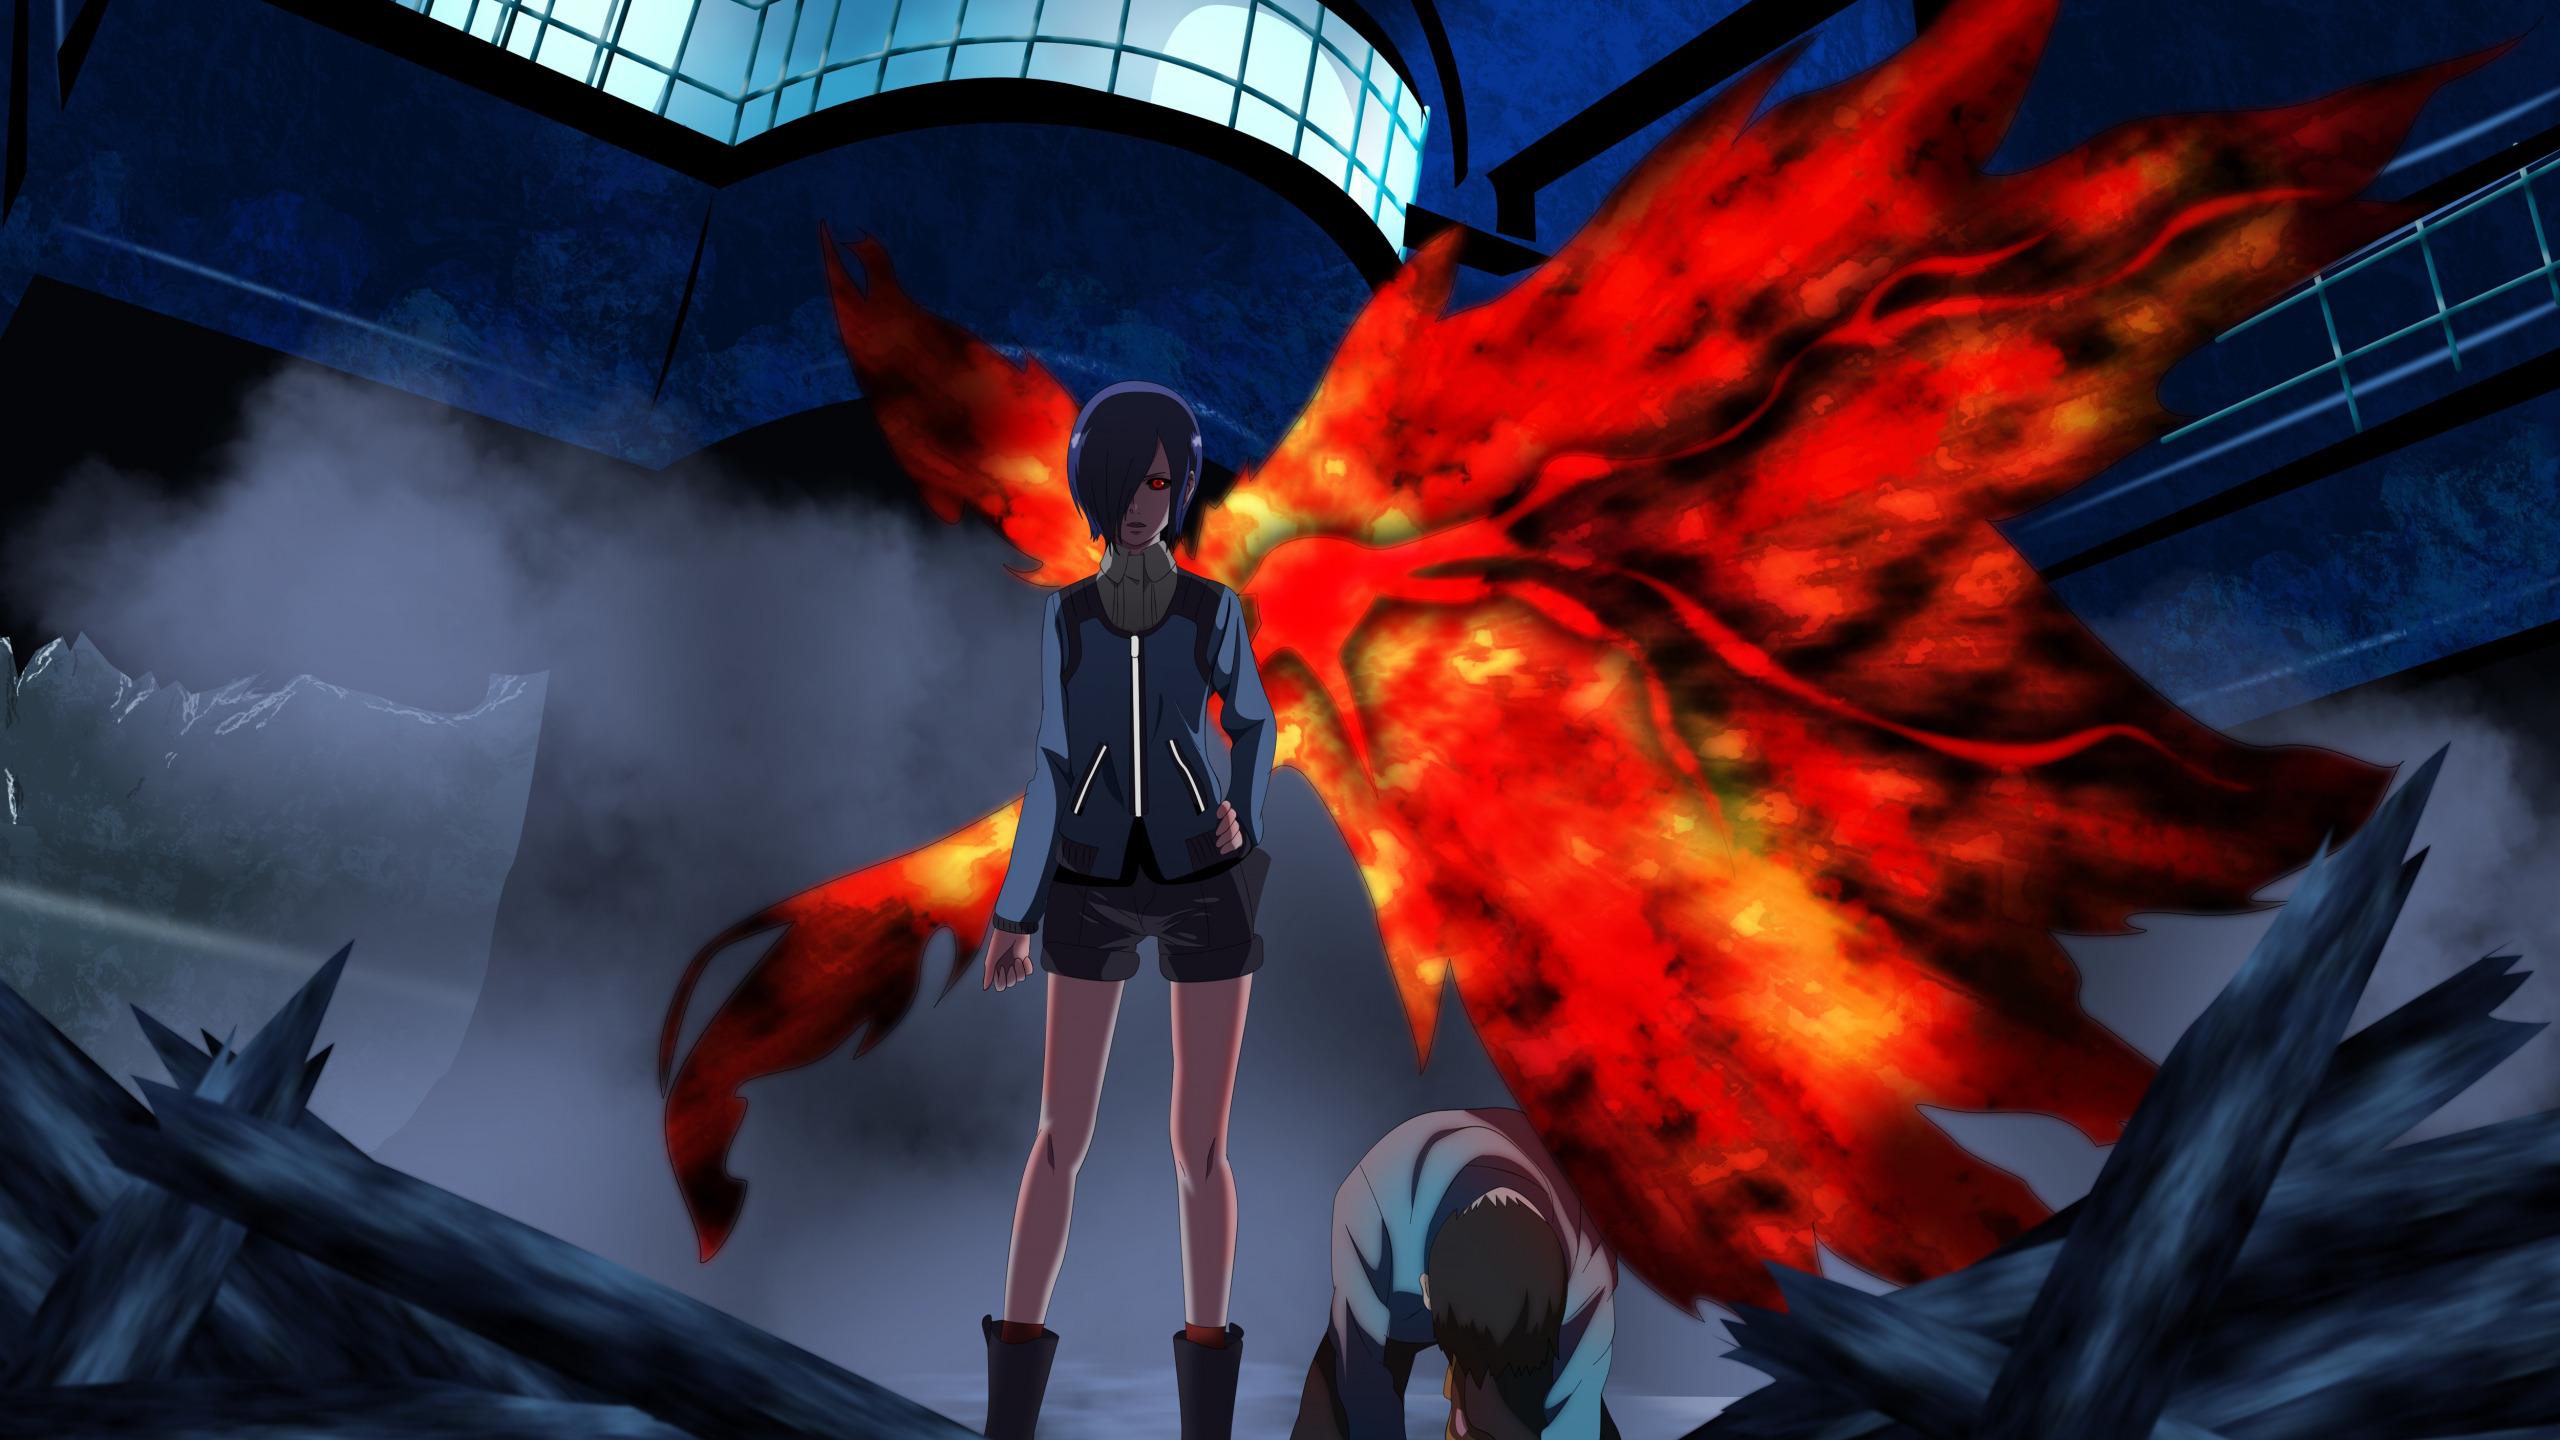 Download Wallpaper Girl Blood Game Monster Anime Wings